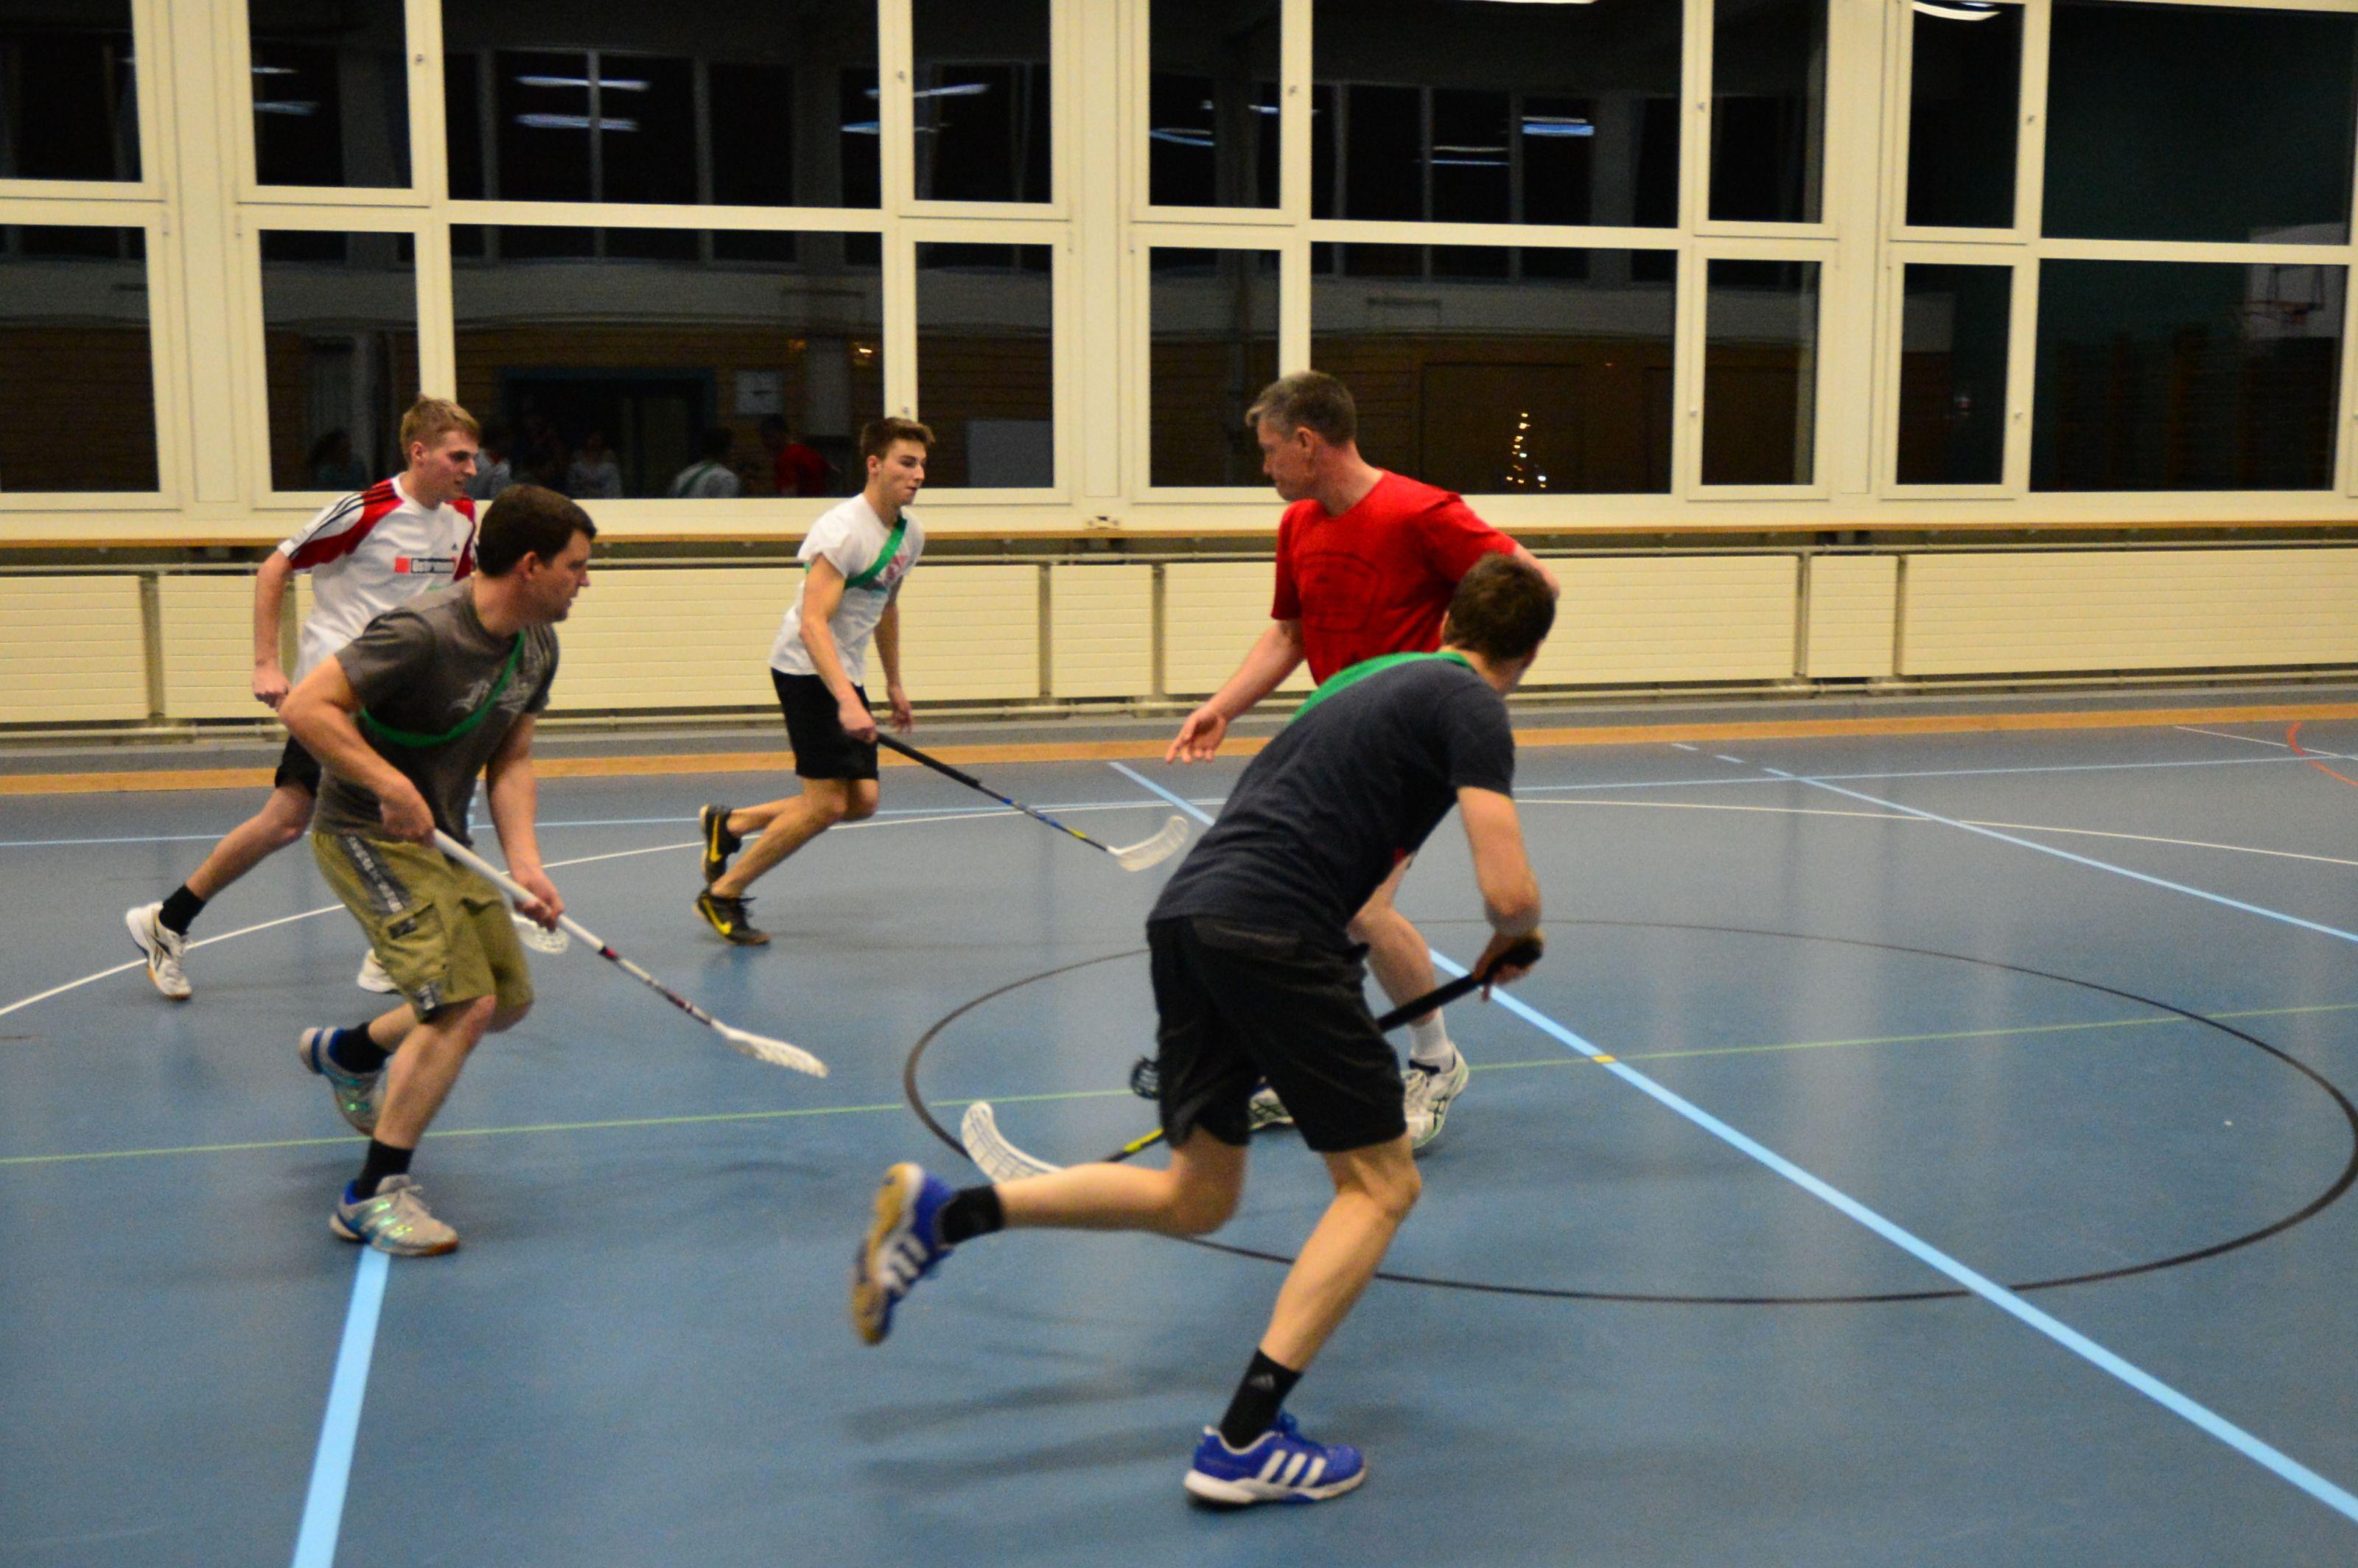 TSVJ-SF-2015-12-08-Unihockey-DSC-CE-8262-web